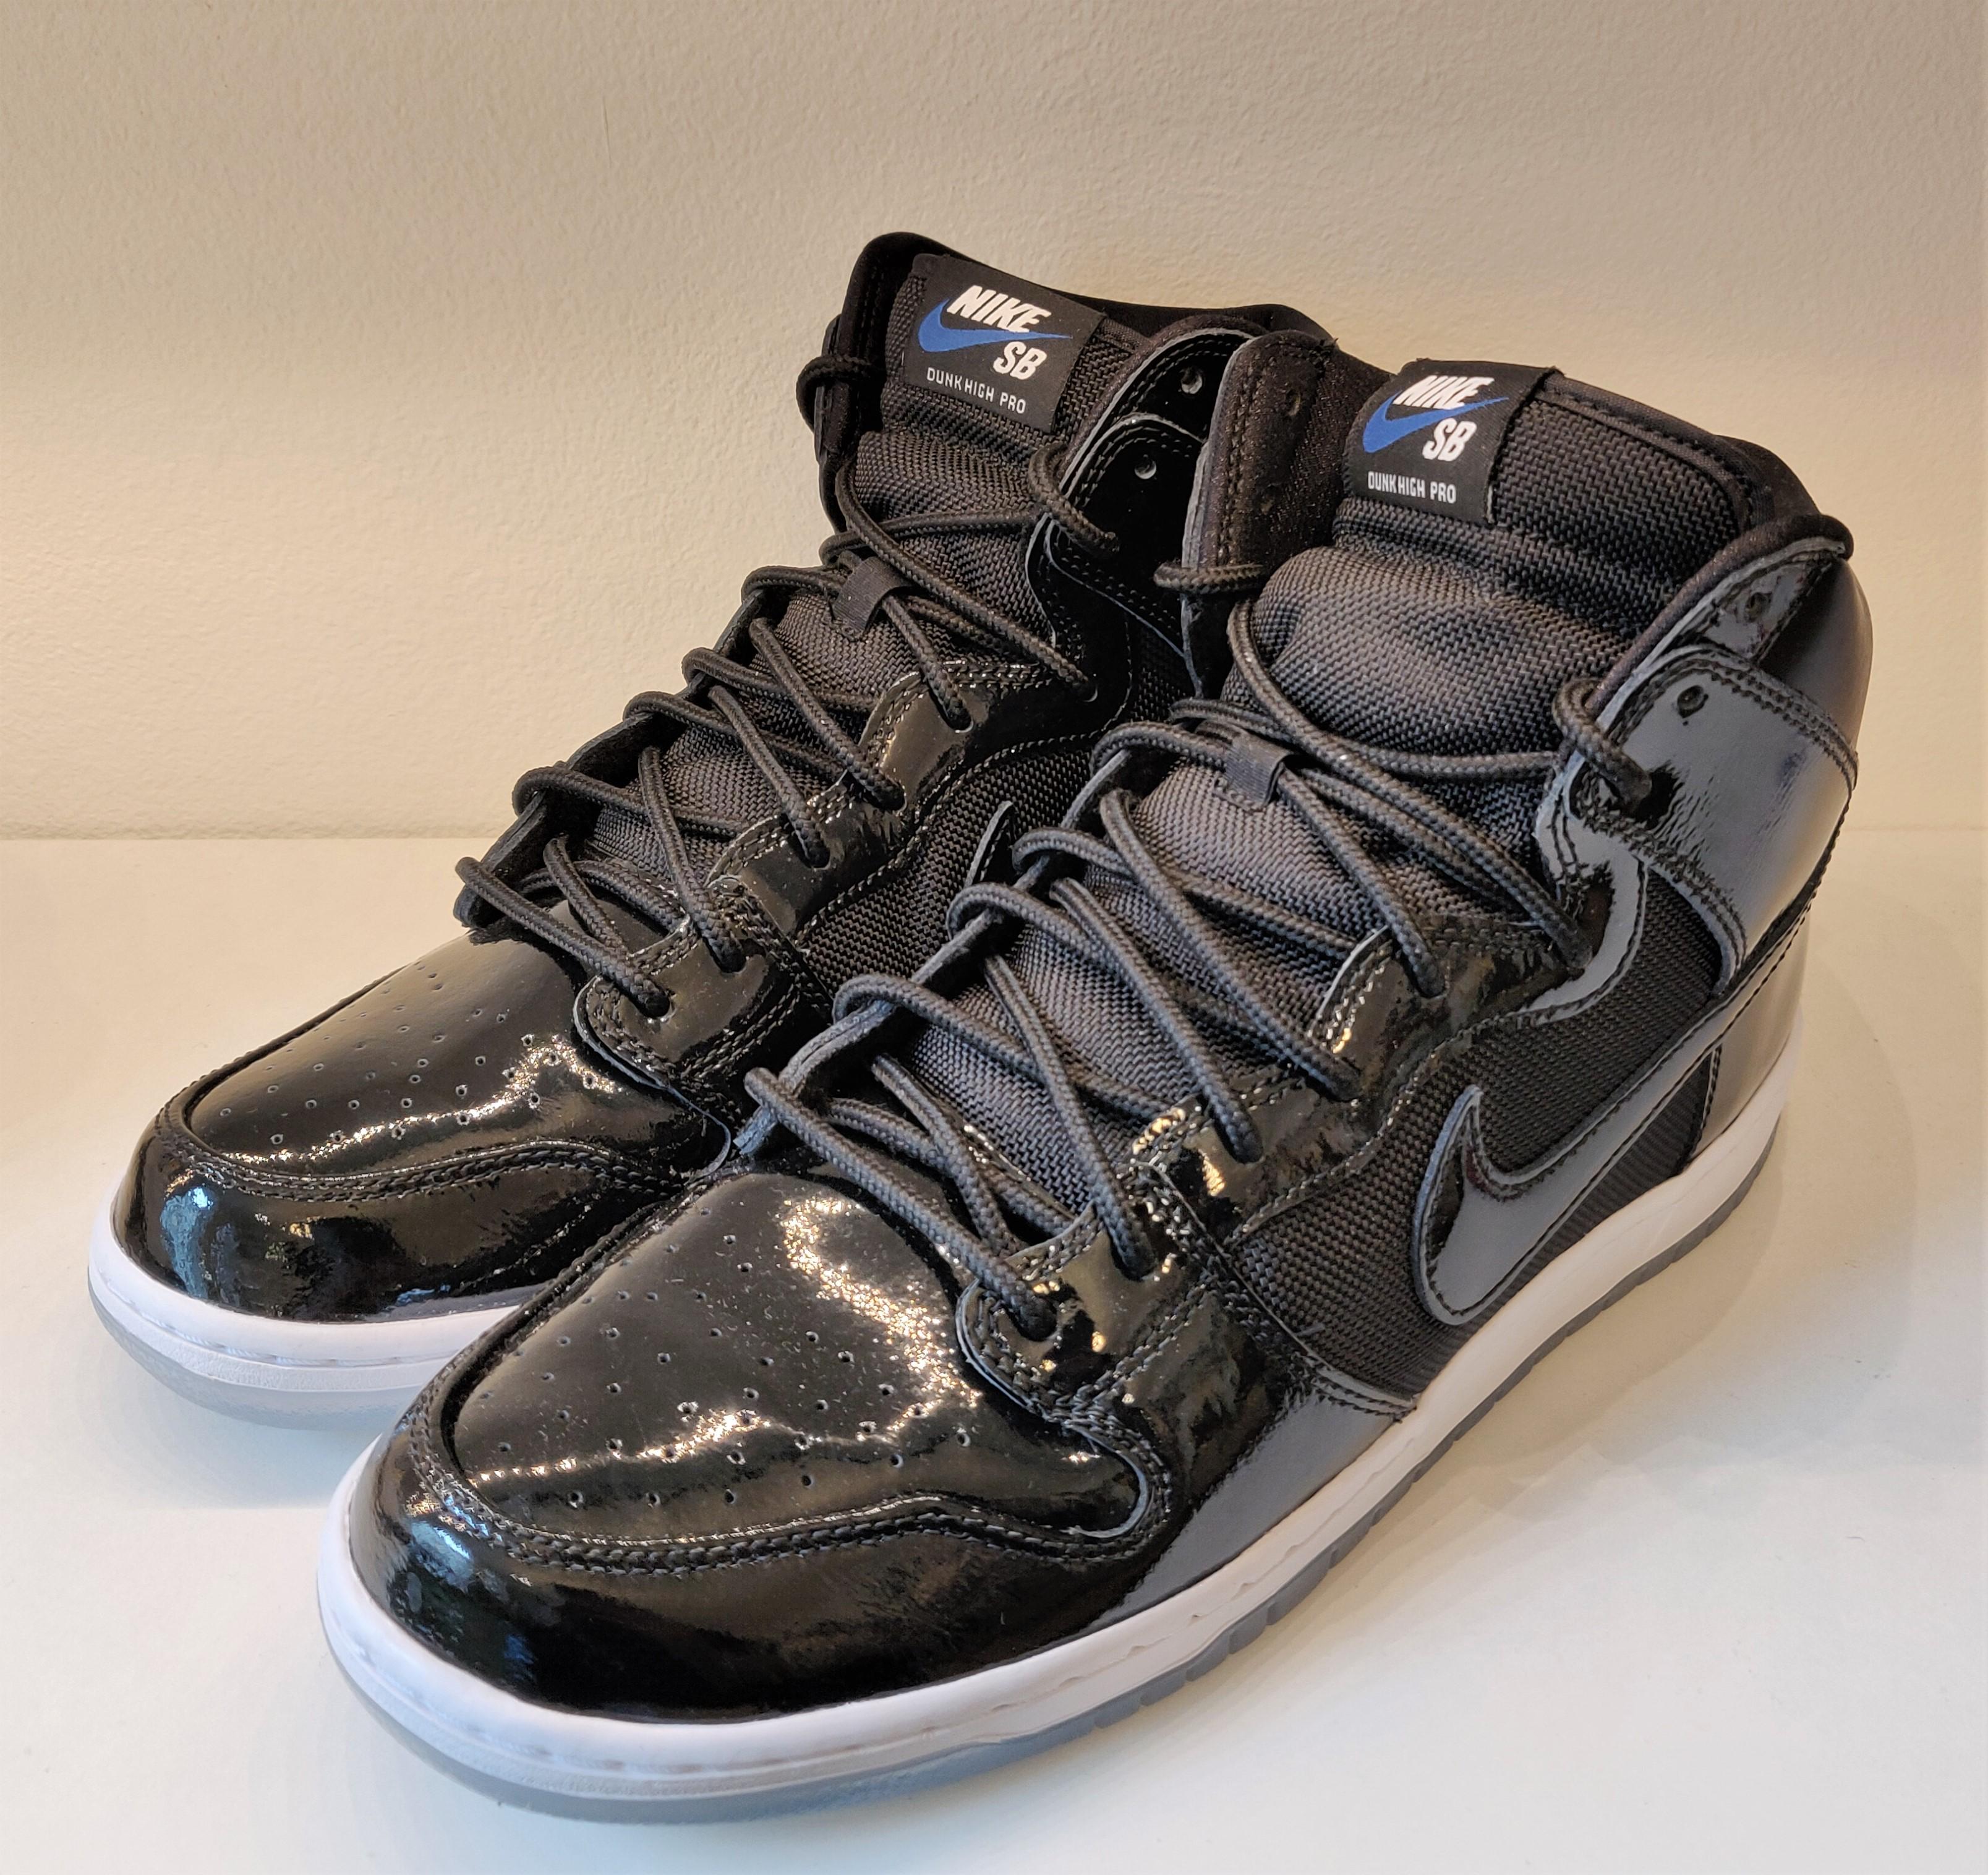 Nike SB Dunk High Space Jam